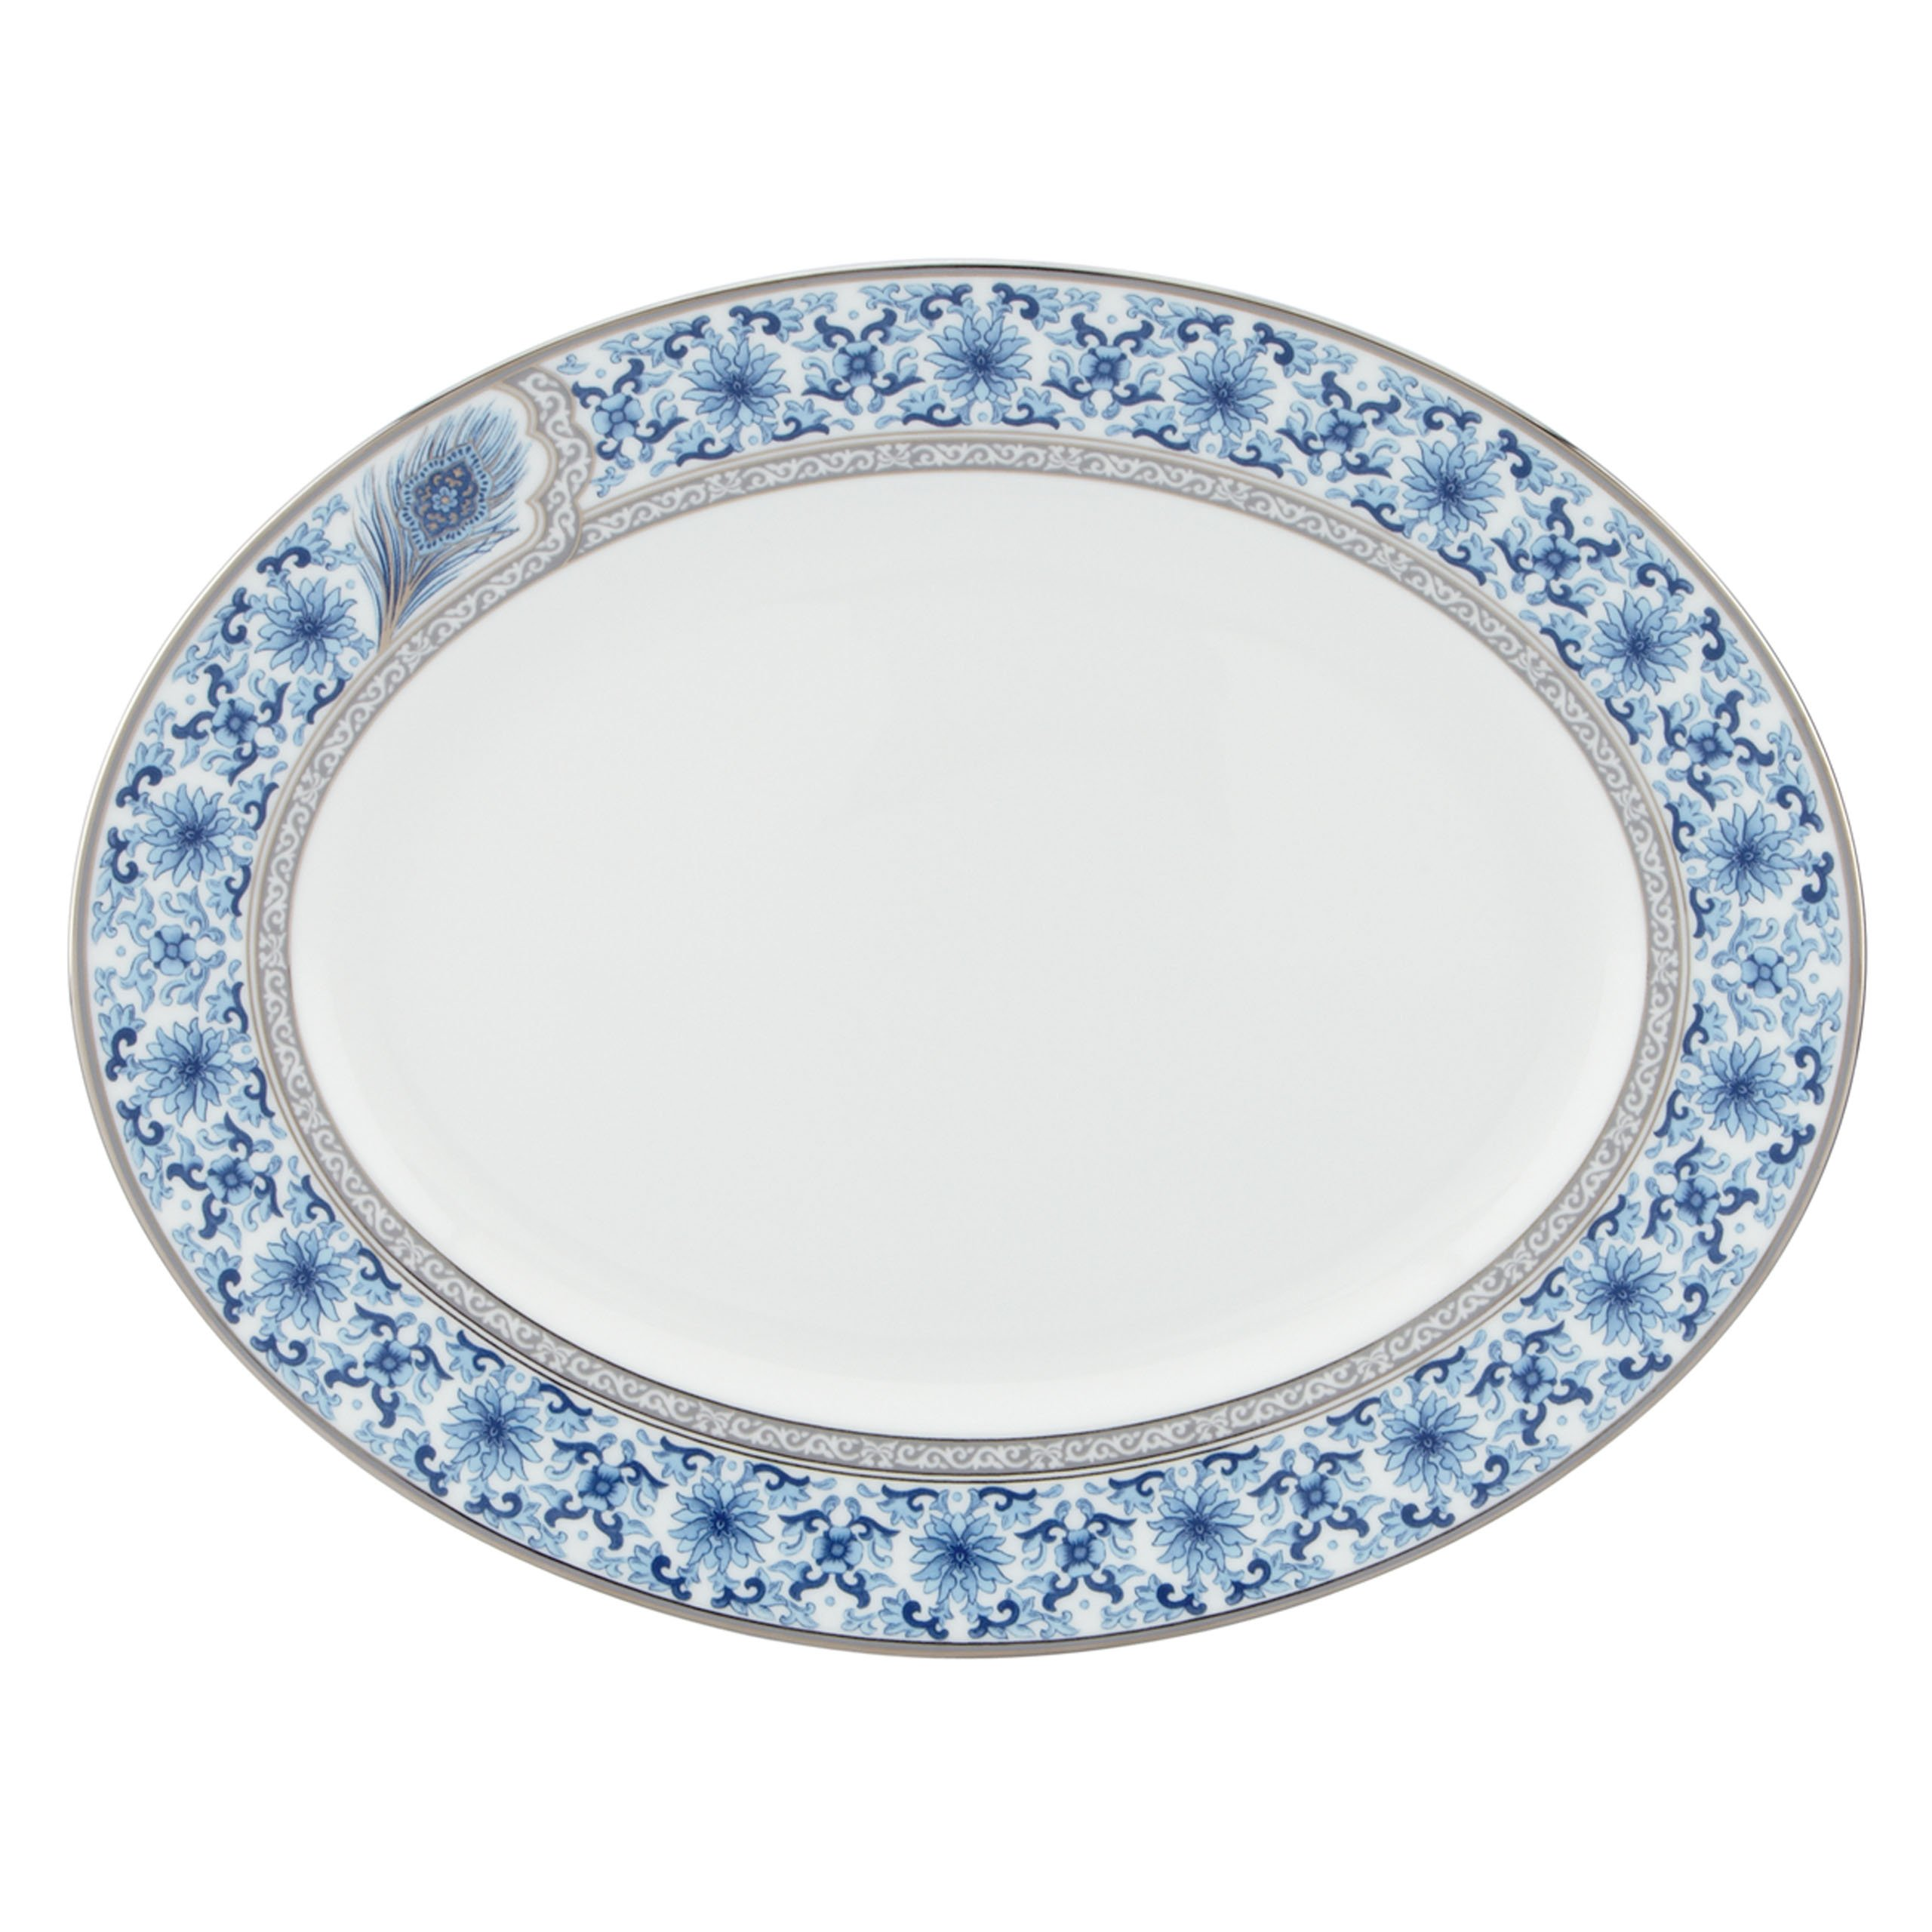 Lenox Marchesa Couture Oval Platter, Sapphire Plume